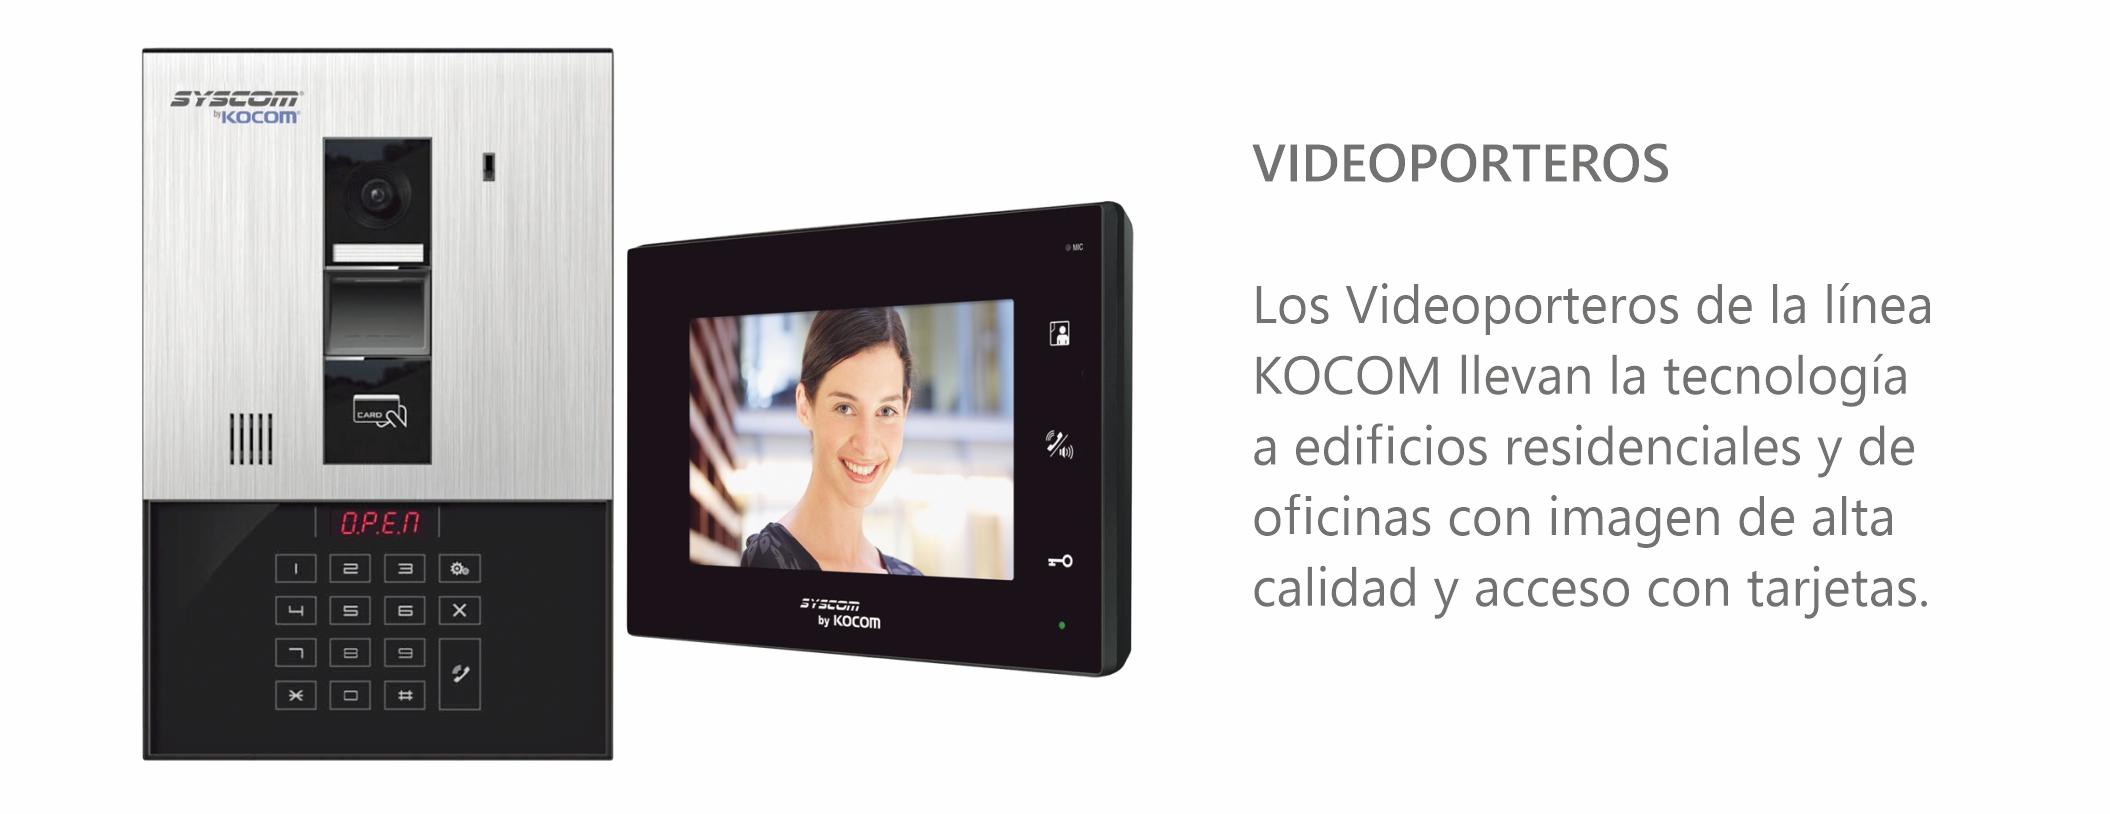 Kocom Videoporteros